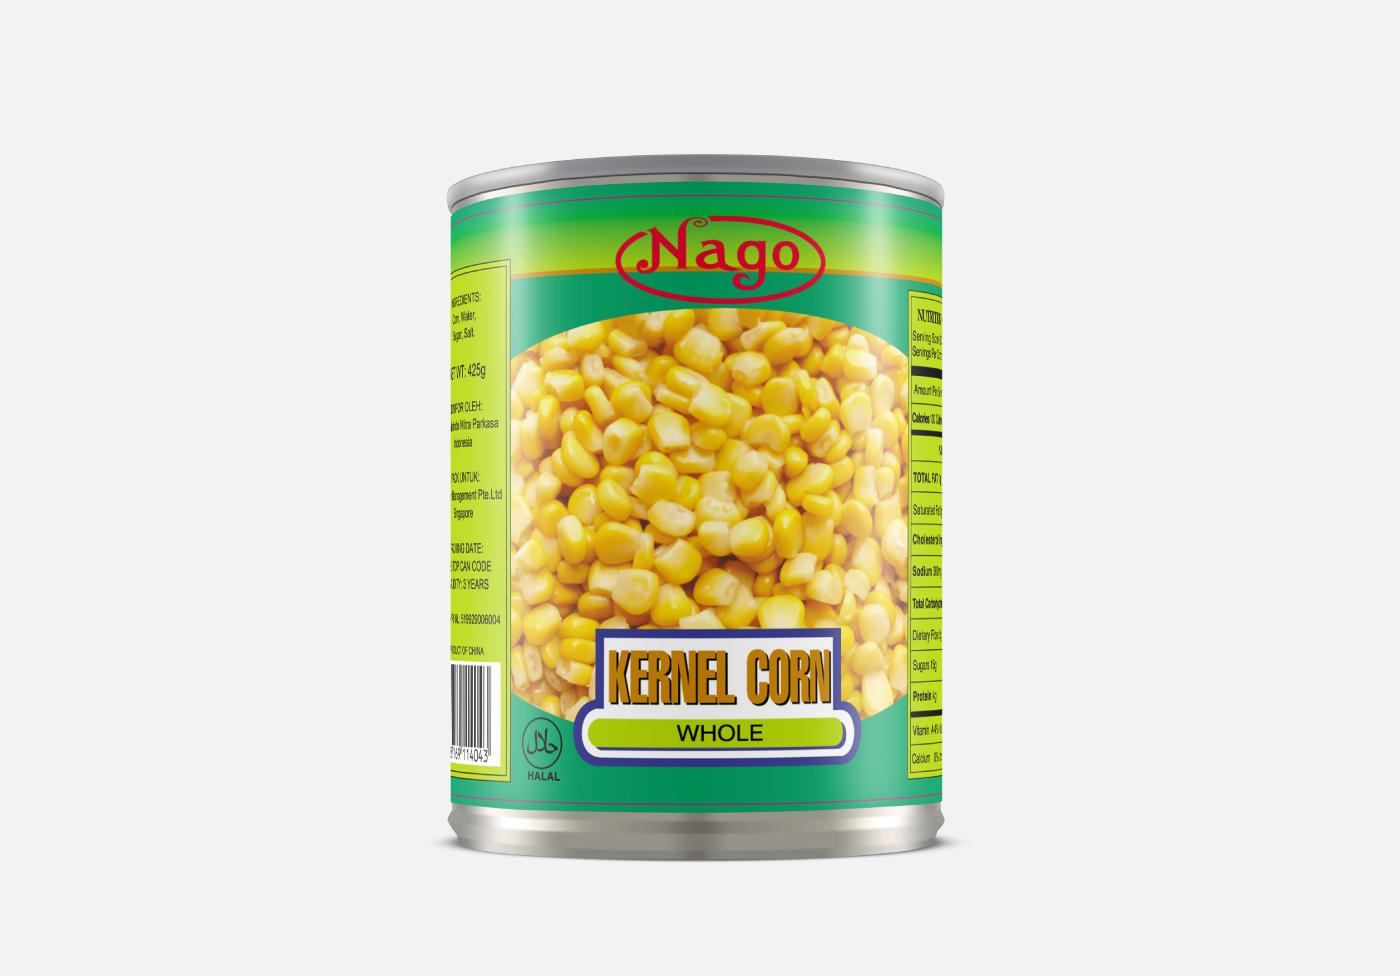 corn canned food packaging mockup